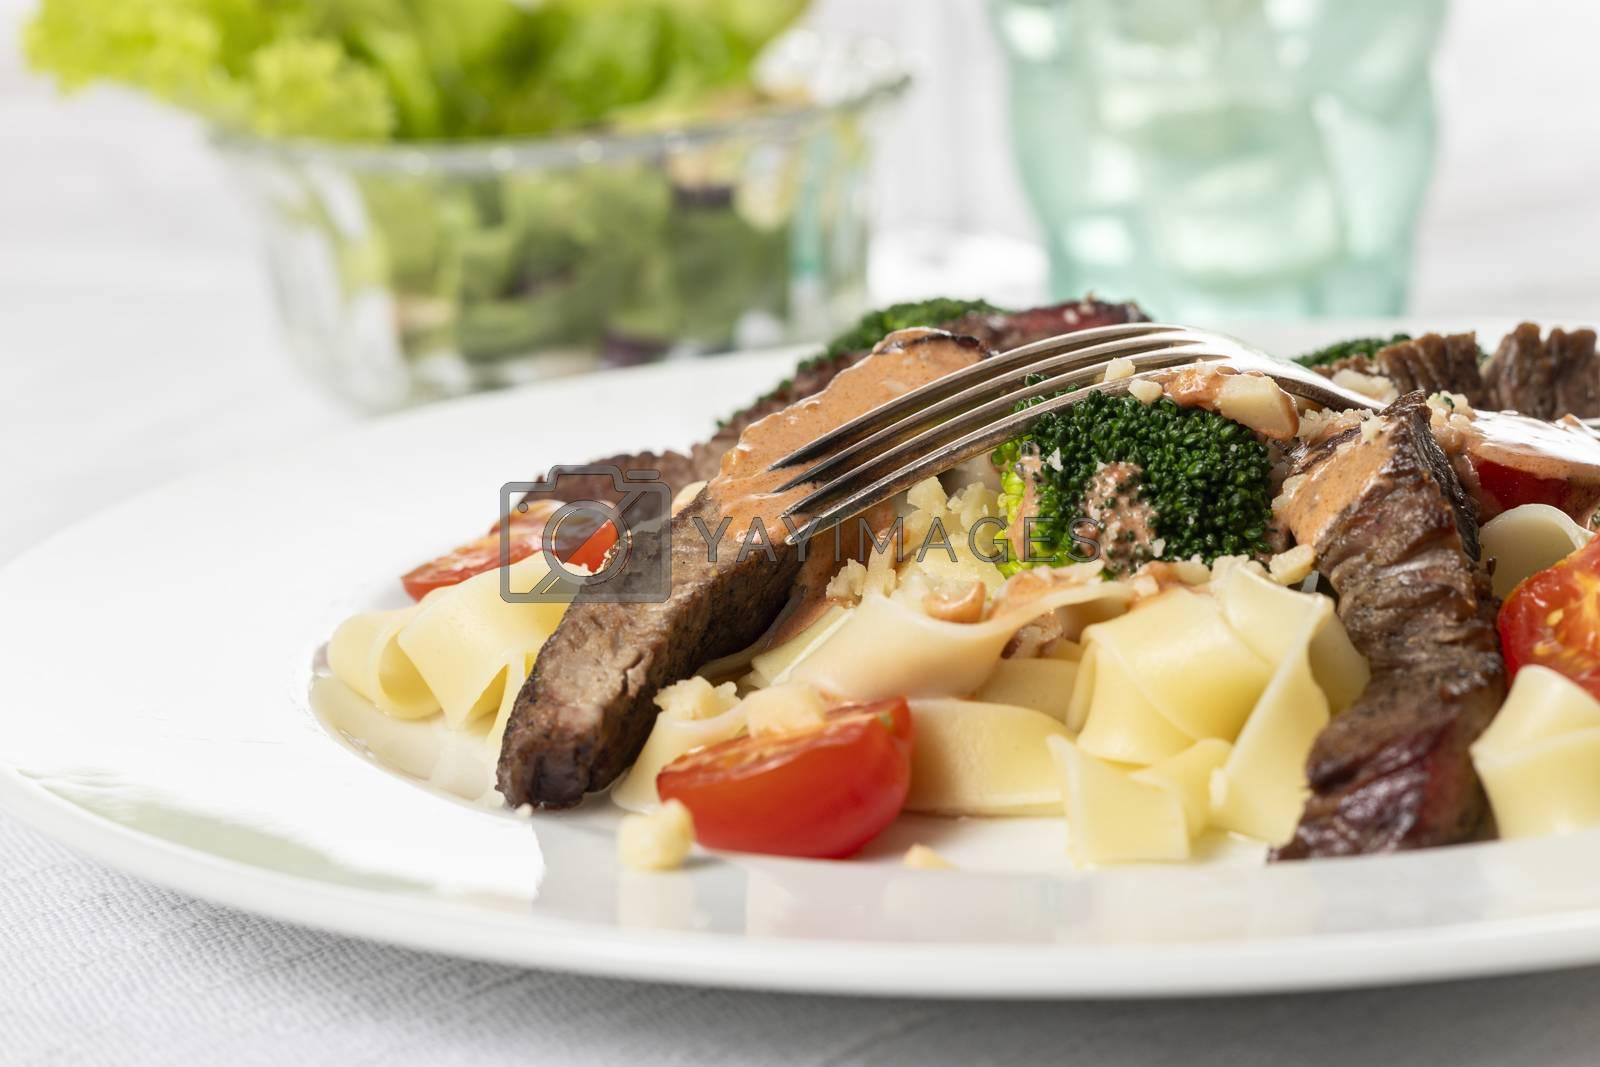 tagliatelli with steak slices on a plate